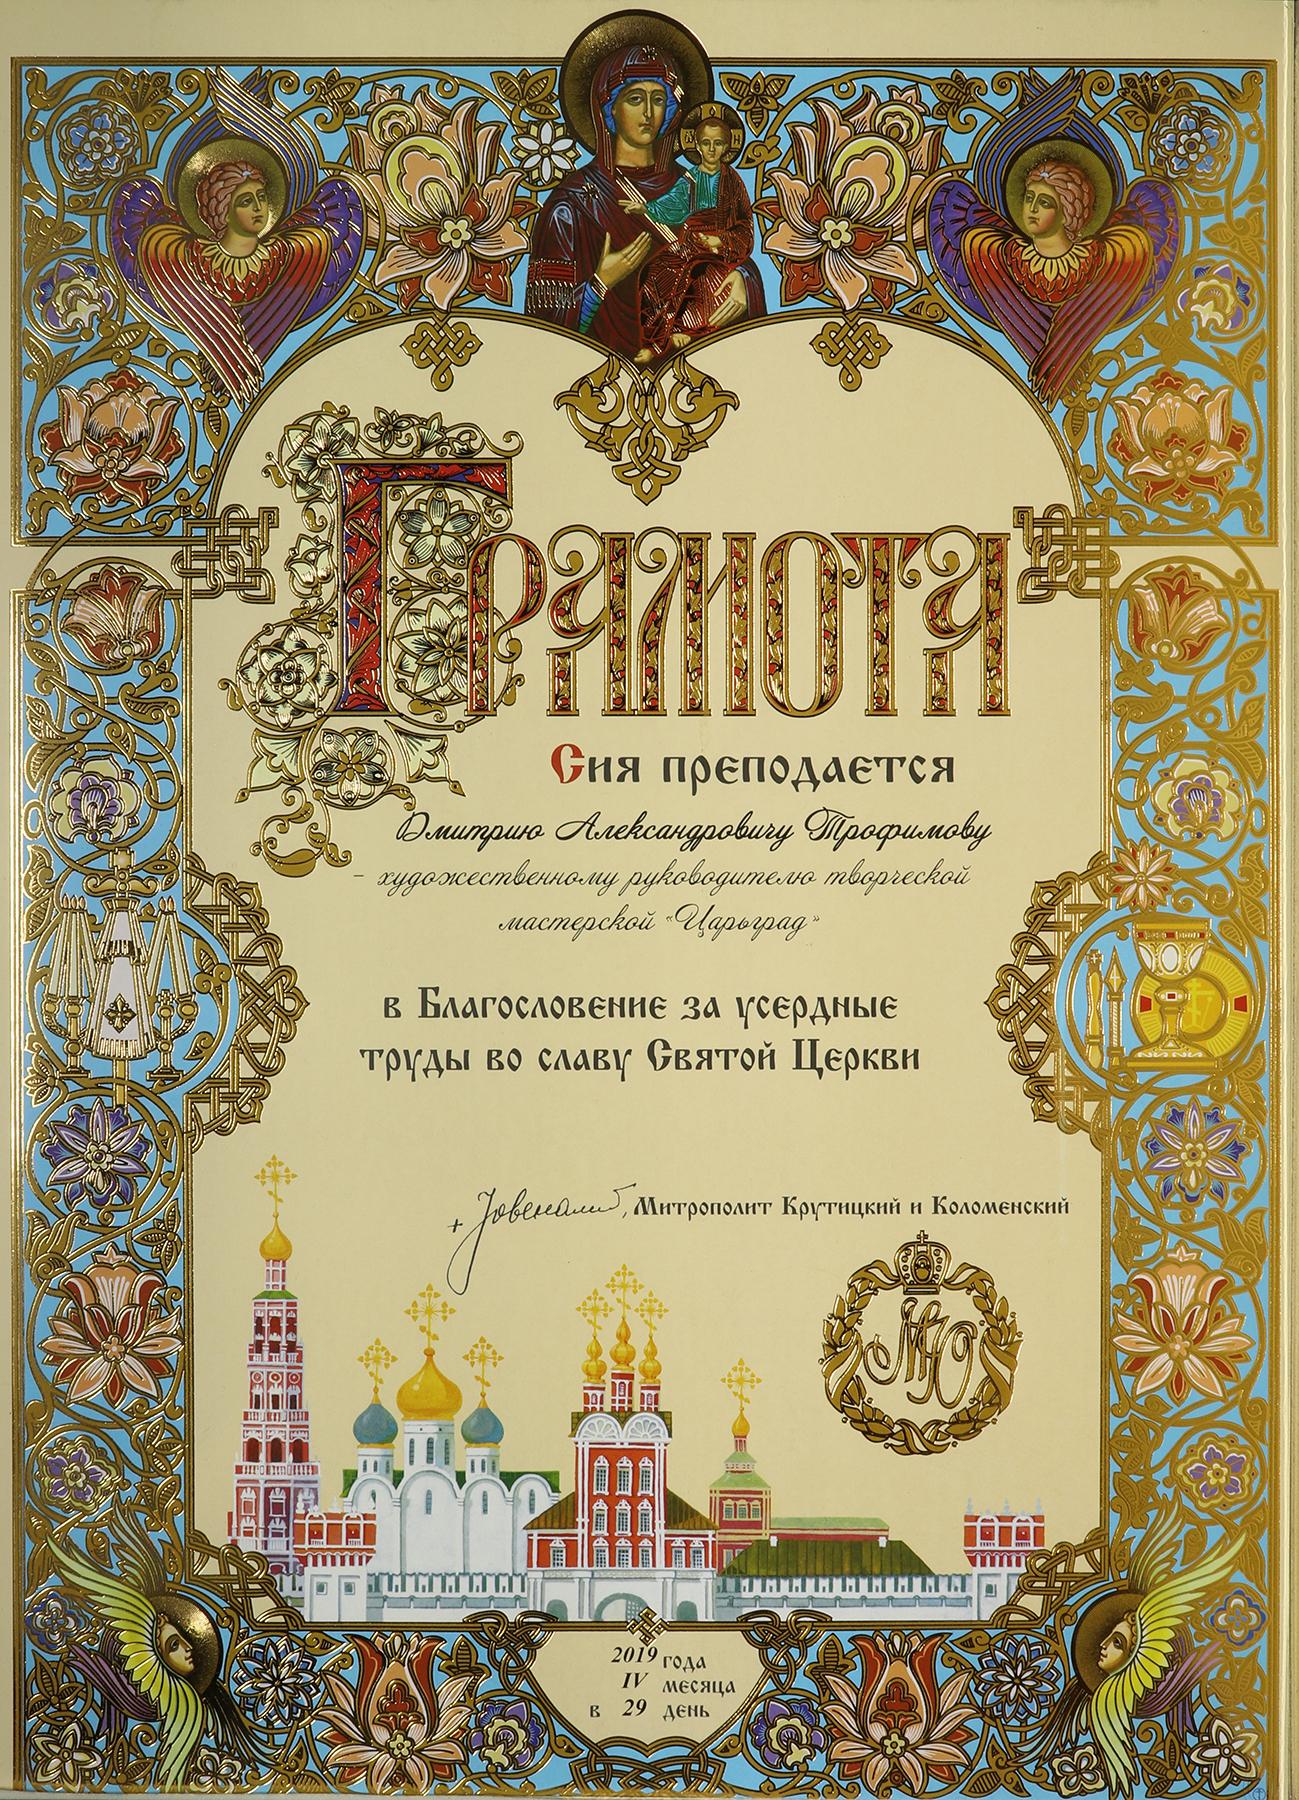 Грамота от митрополита Крутицкого и Коломенского